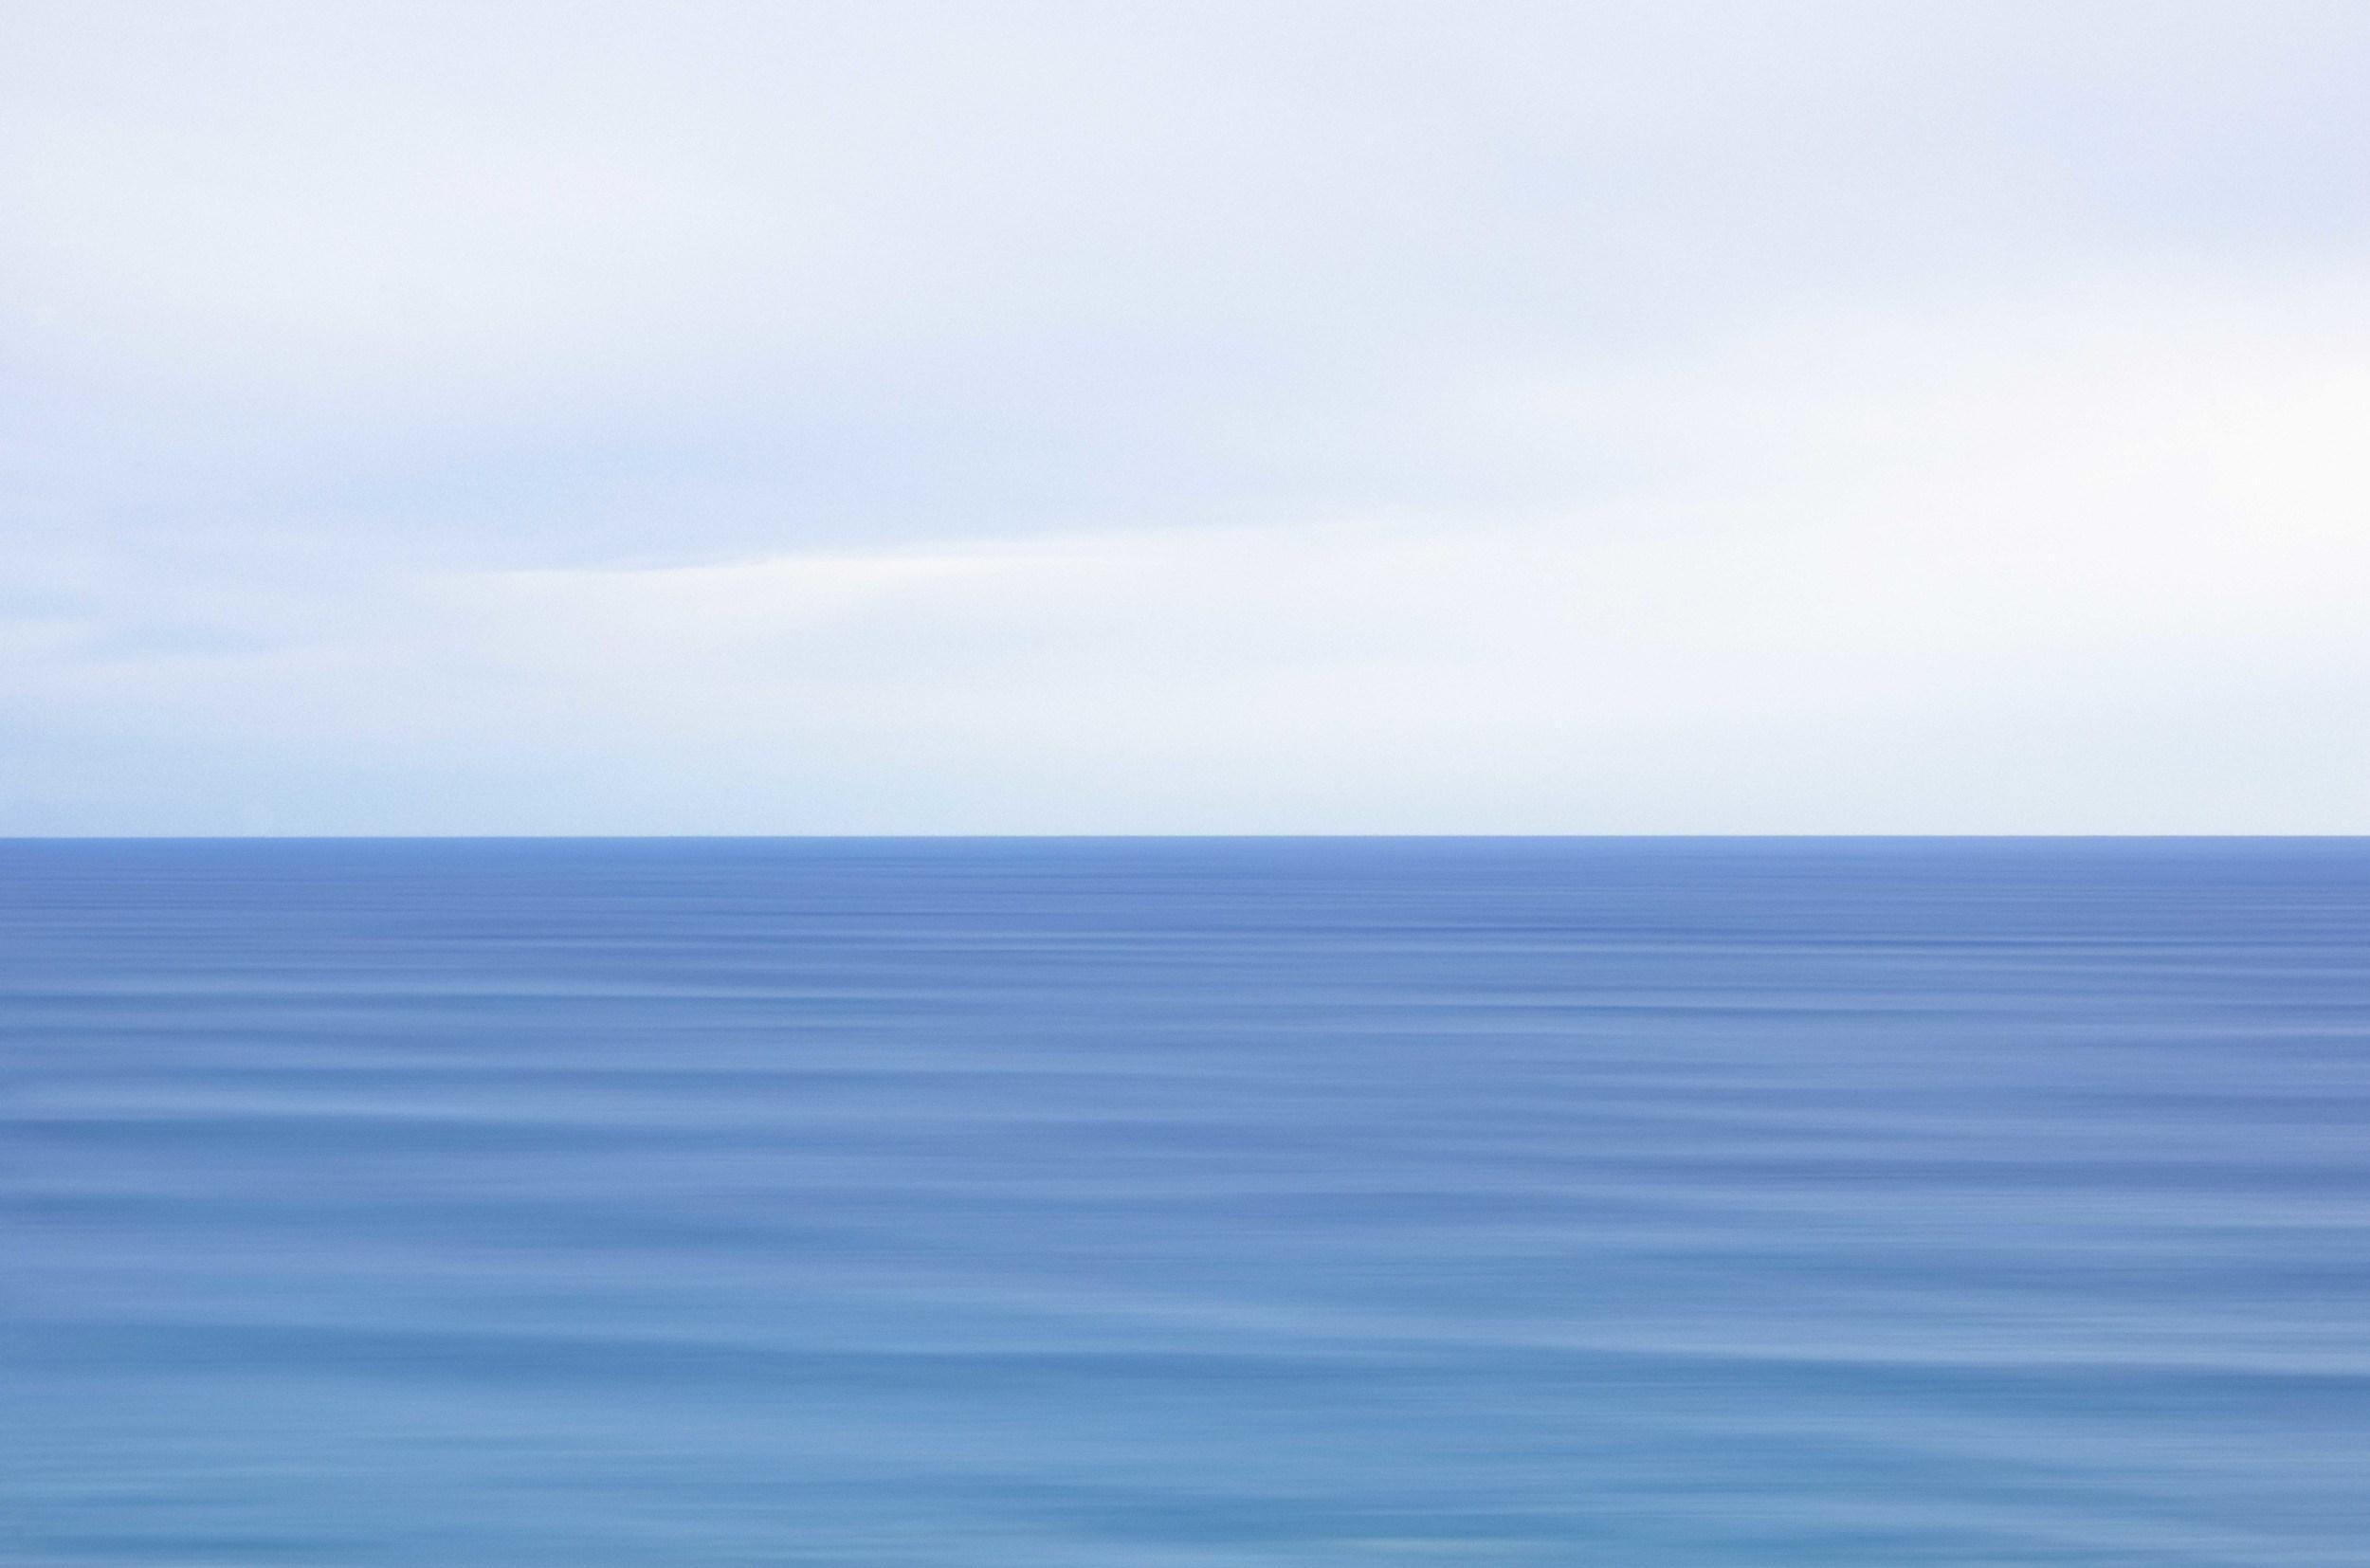 Balance at the Horizon